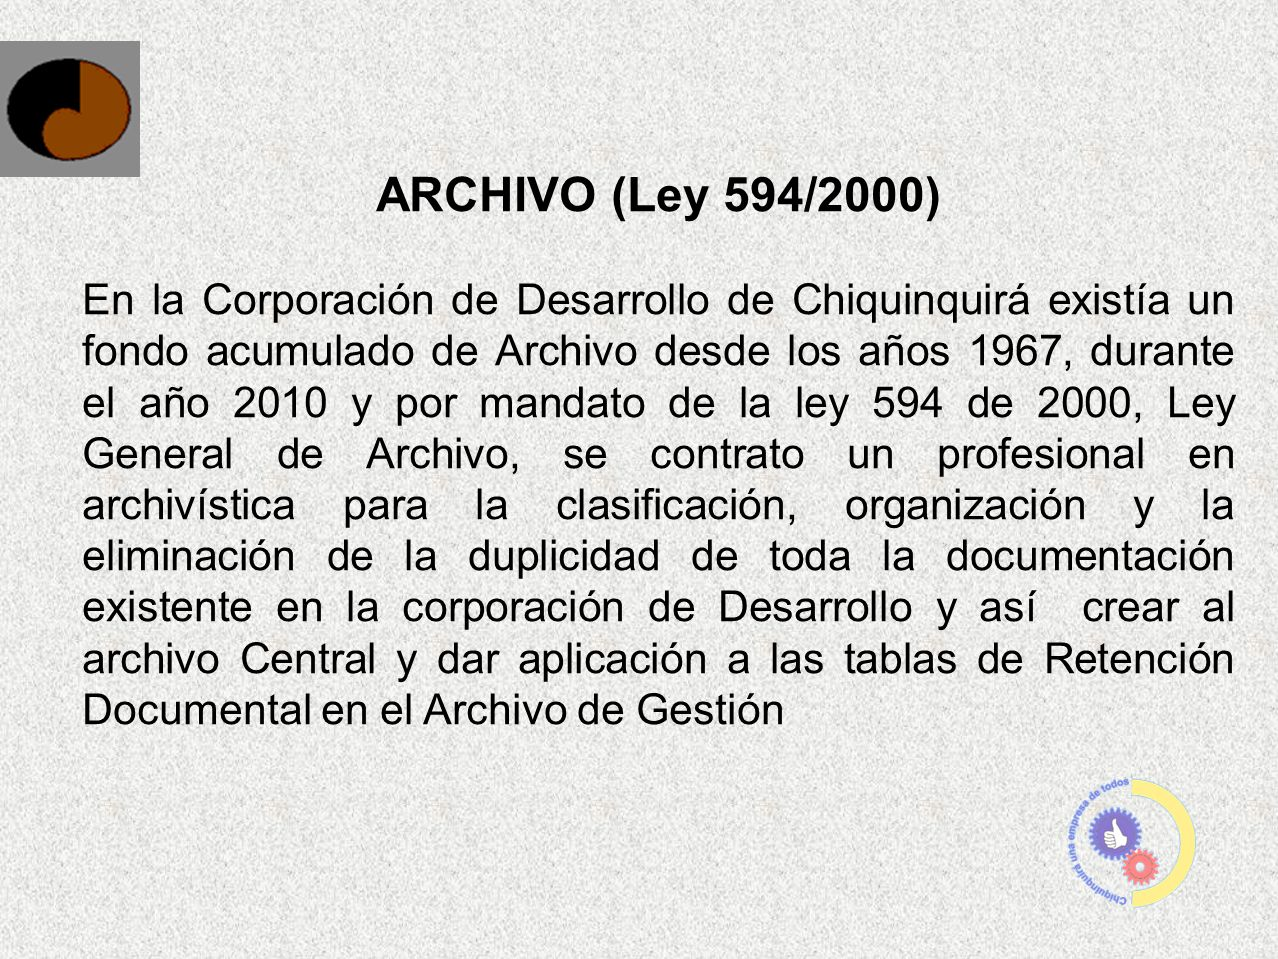 ARCHIVO (Ley 594/2000)